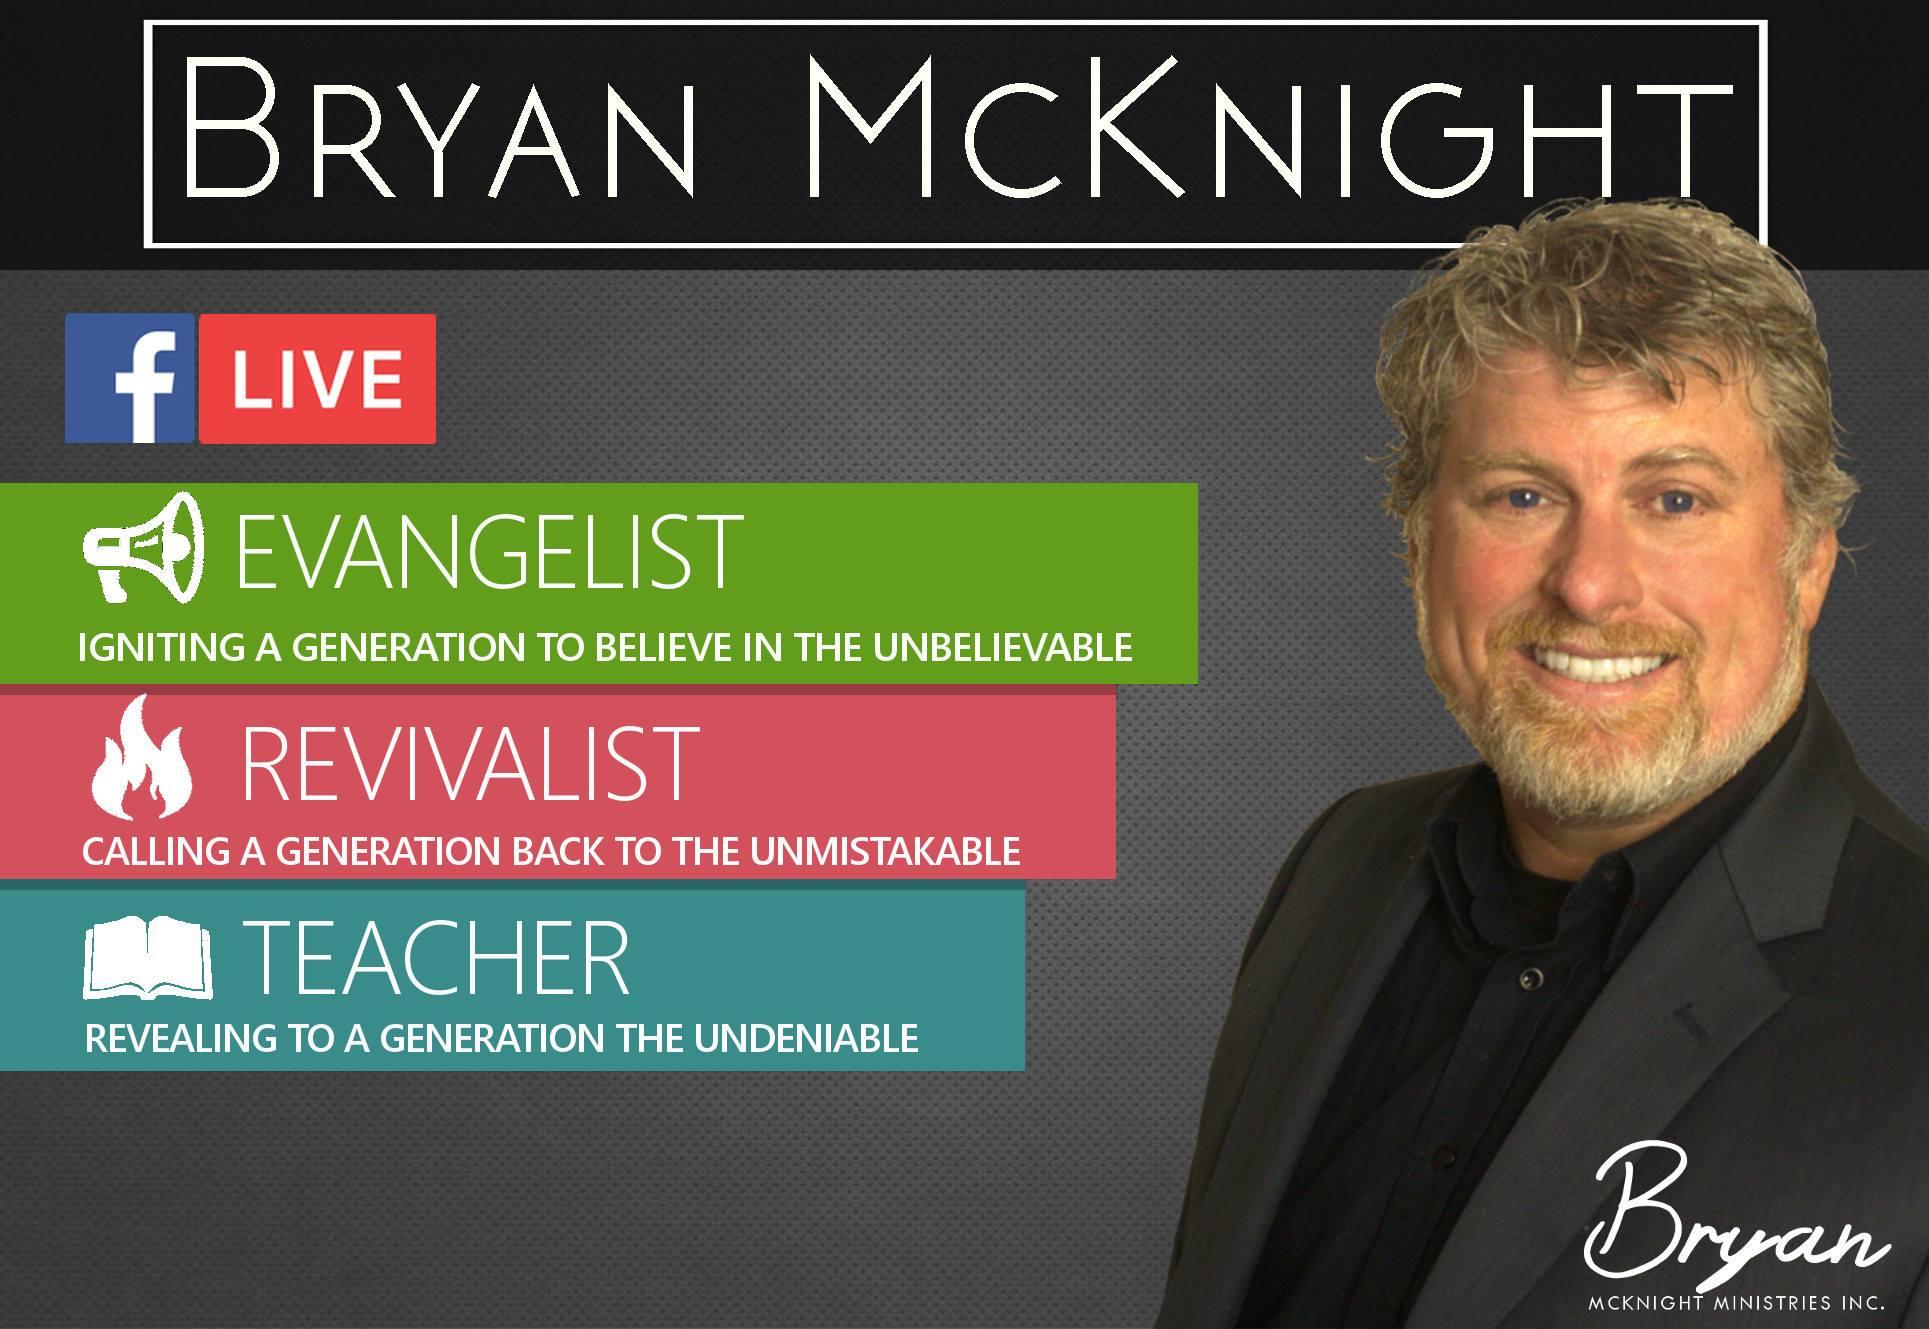 Bryan McKnight Ministires